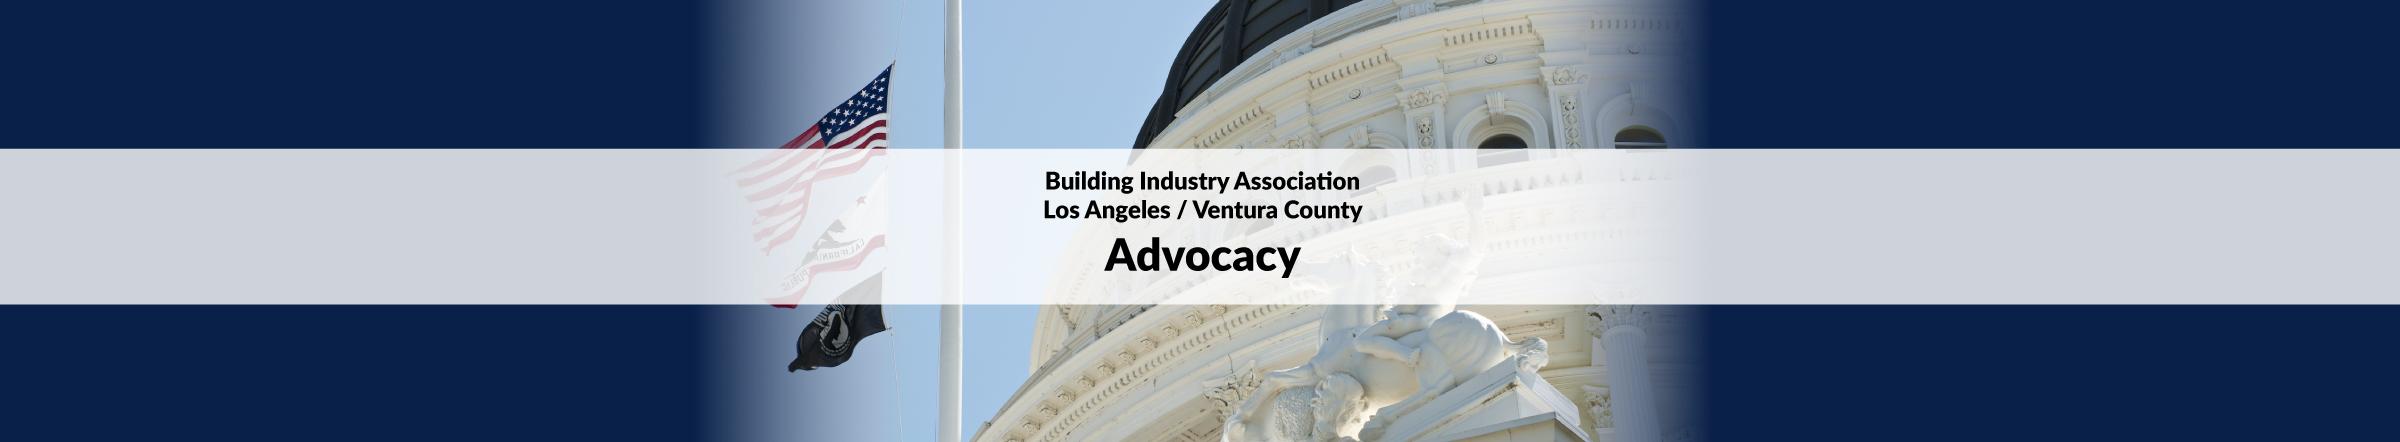 bia-slide-5-advocacy-3